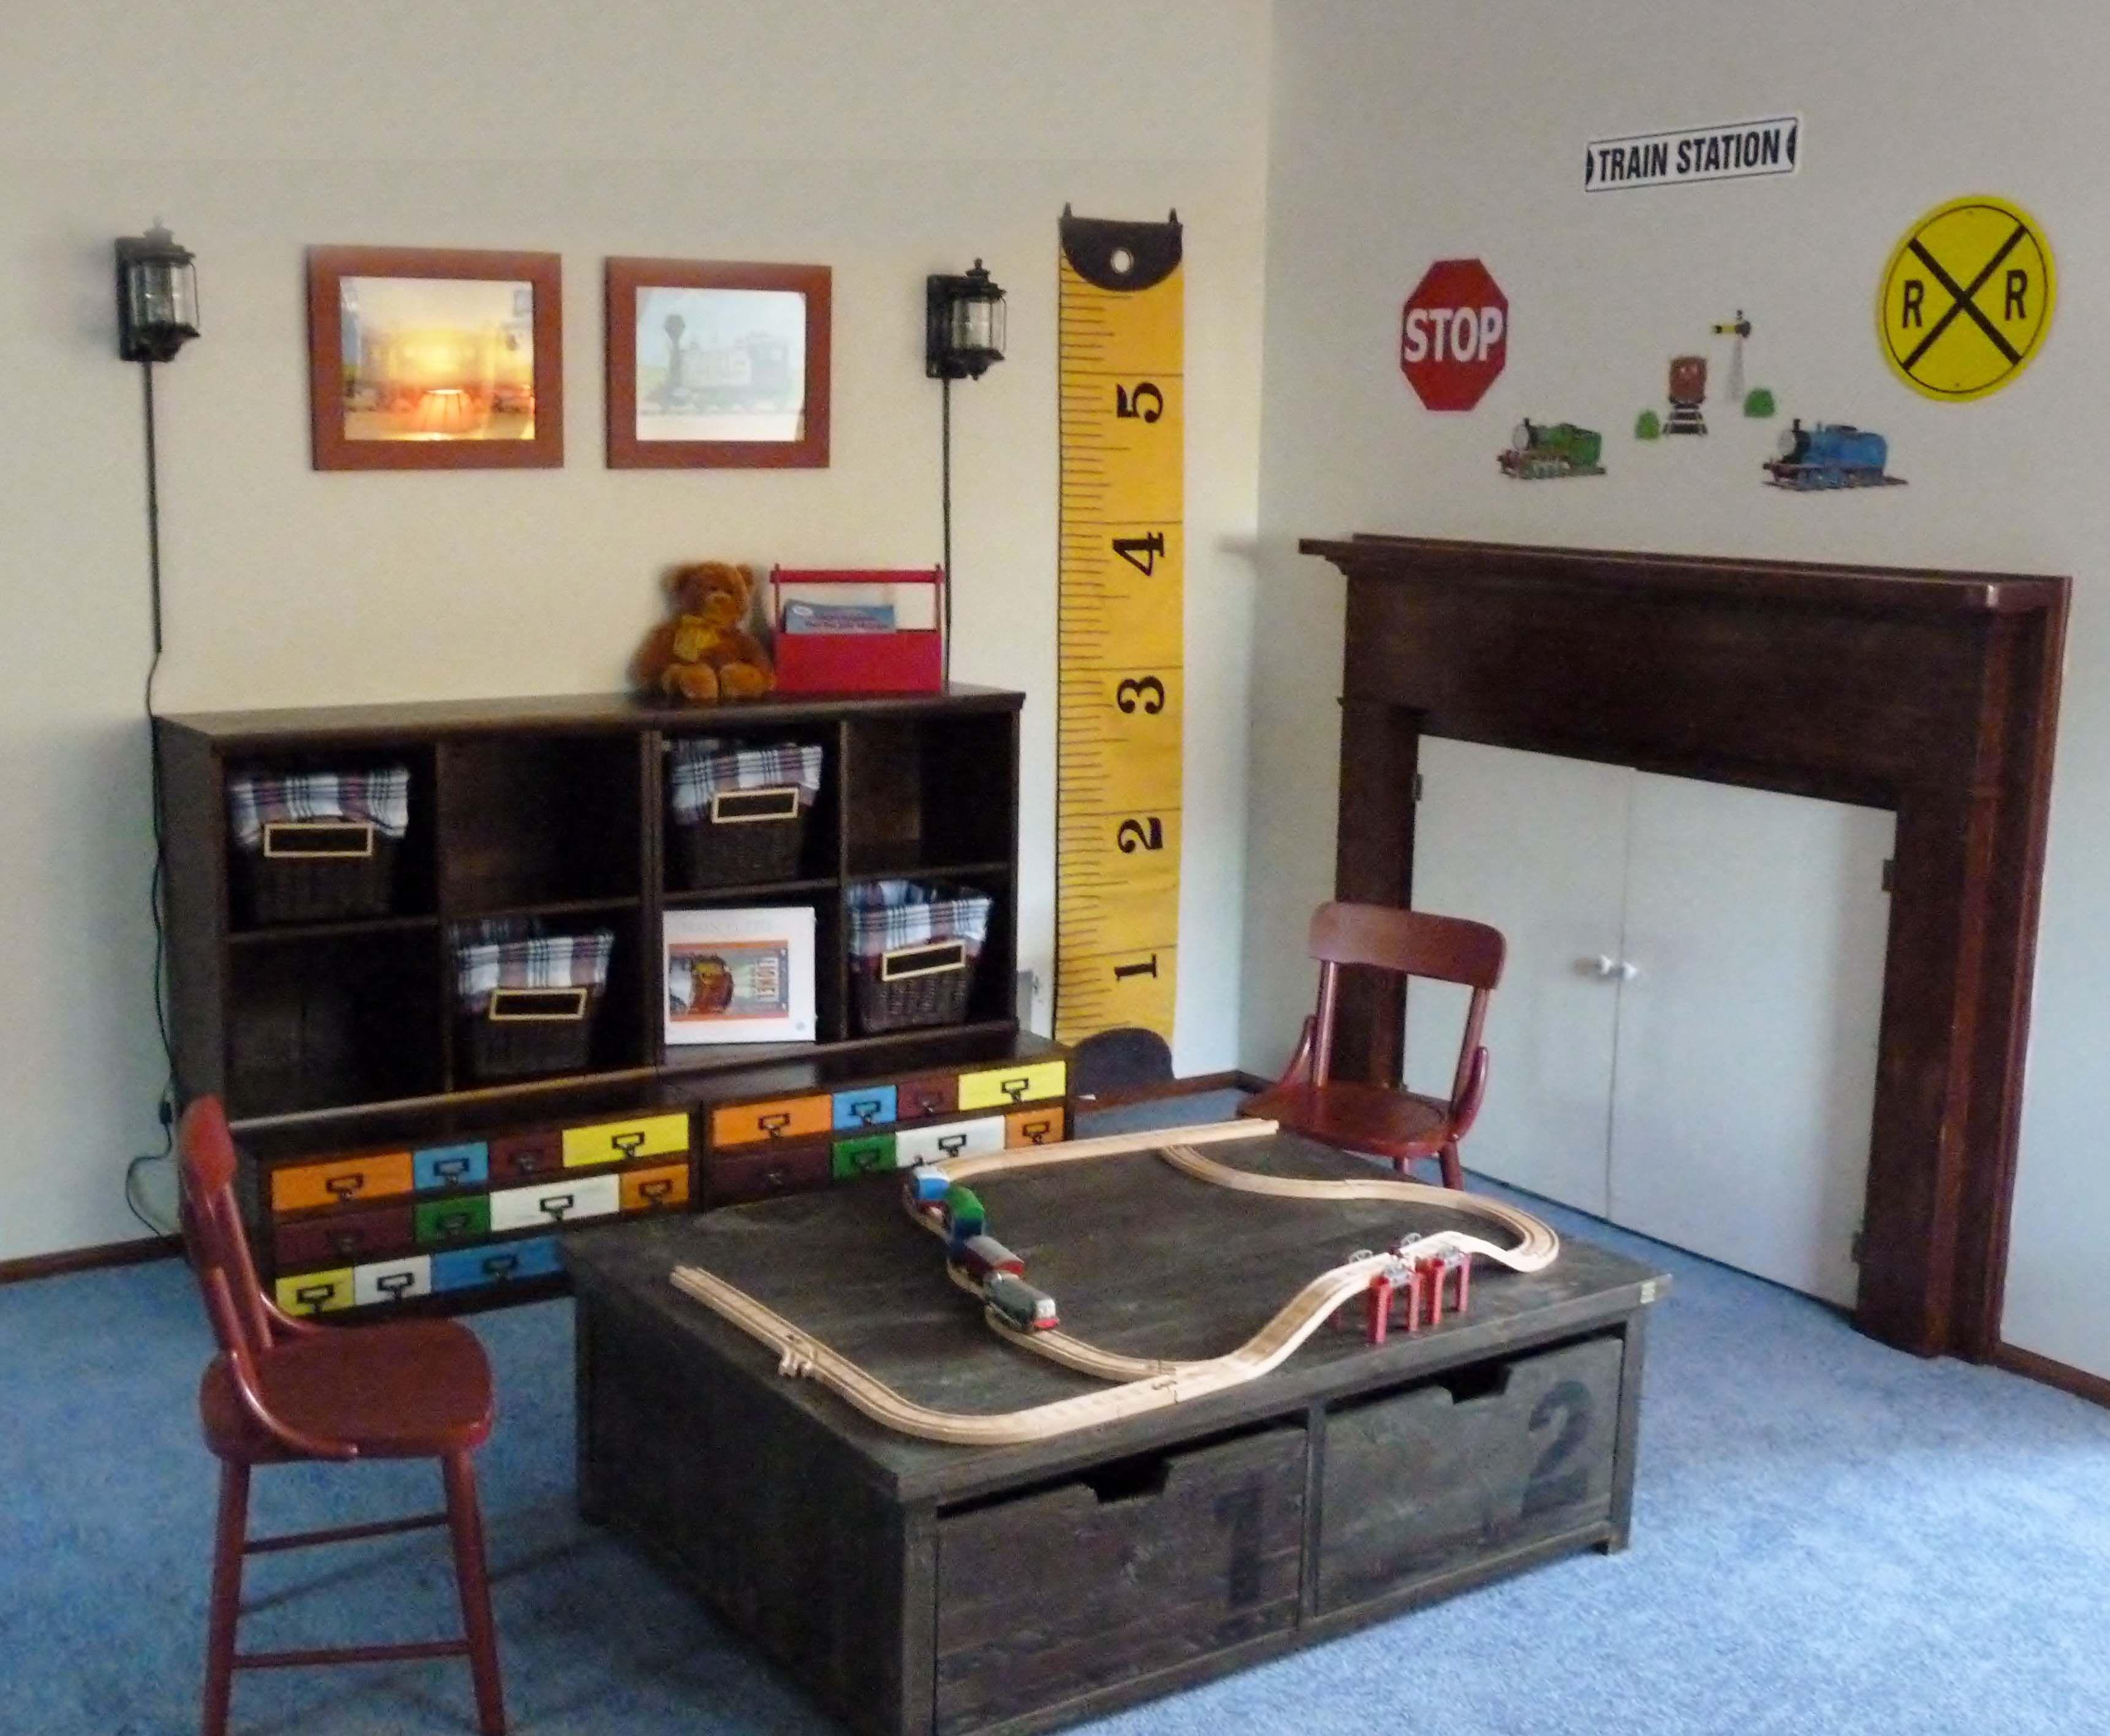 Coastal Decor And Interior Design By Nicole Rice Fair Haven Nj Train Decor Turquoise Living Room Decor Design